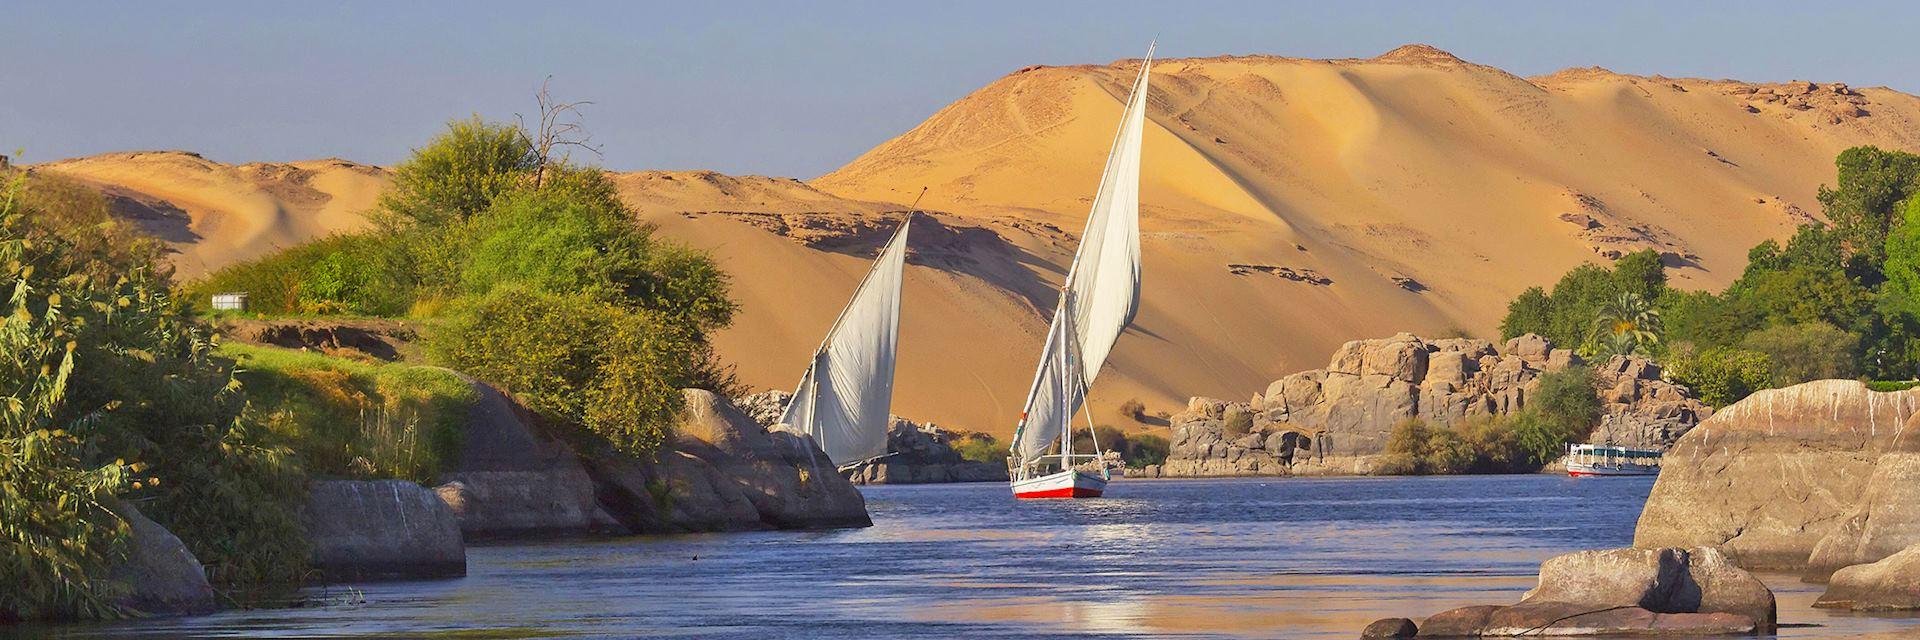 Sailing boats on the Nile near Aswan